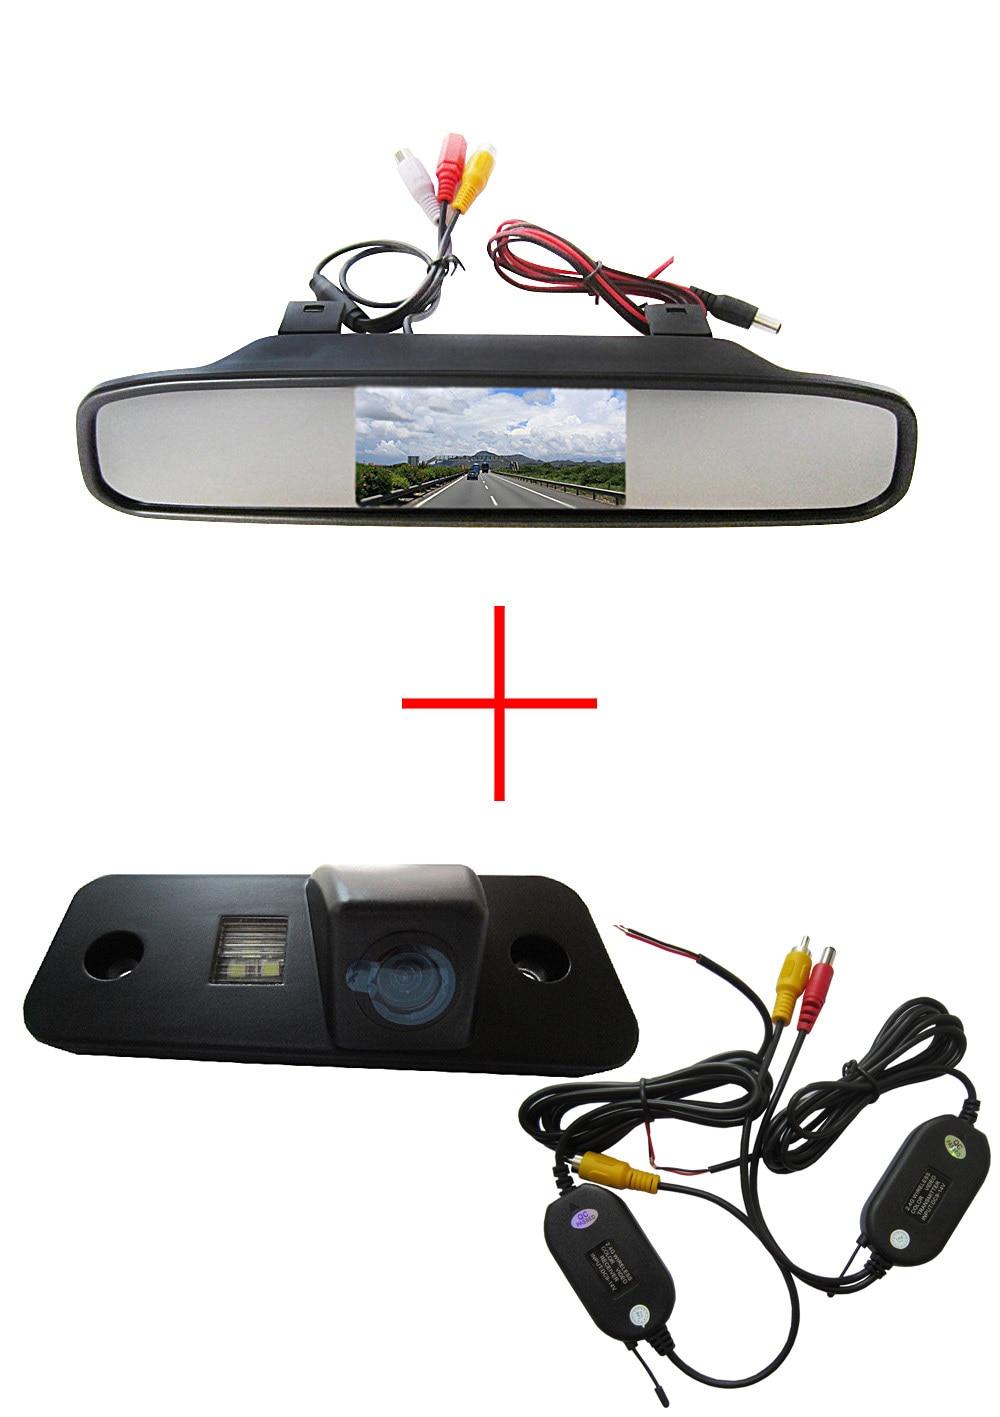 Wireless Color CCD Chip Car Rear View Camera for Hyundai Santa Fe santafe | Azera + 4.3 Inch  rearview Mirror Monitor wireless color ccd chip car rear view camera for kia sorento sportage 4 3 inch foldable lcd tft monitor